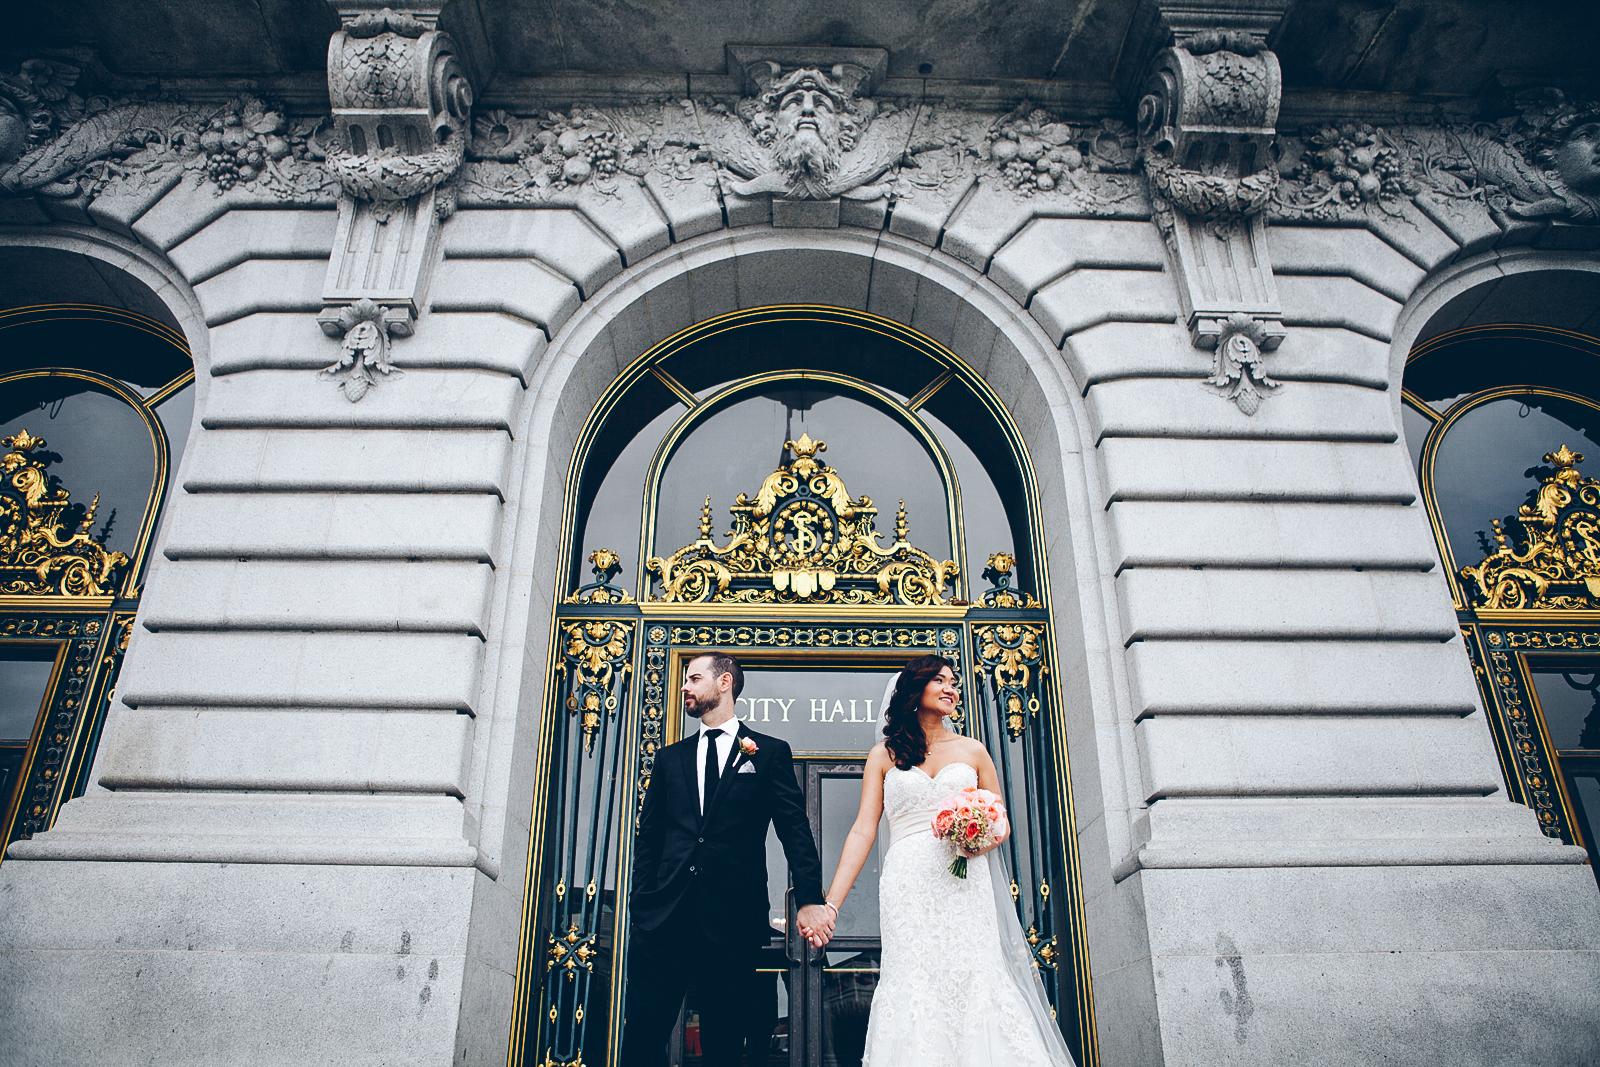 San_francisco_city_hall_wedding_photography_meegan_travis_ebony_siovhan_bokeh_photography_56.jpg